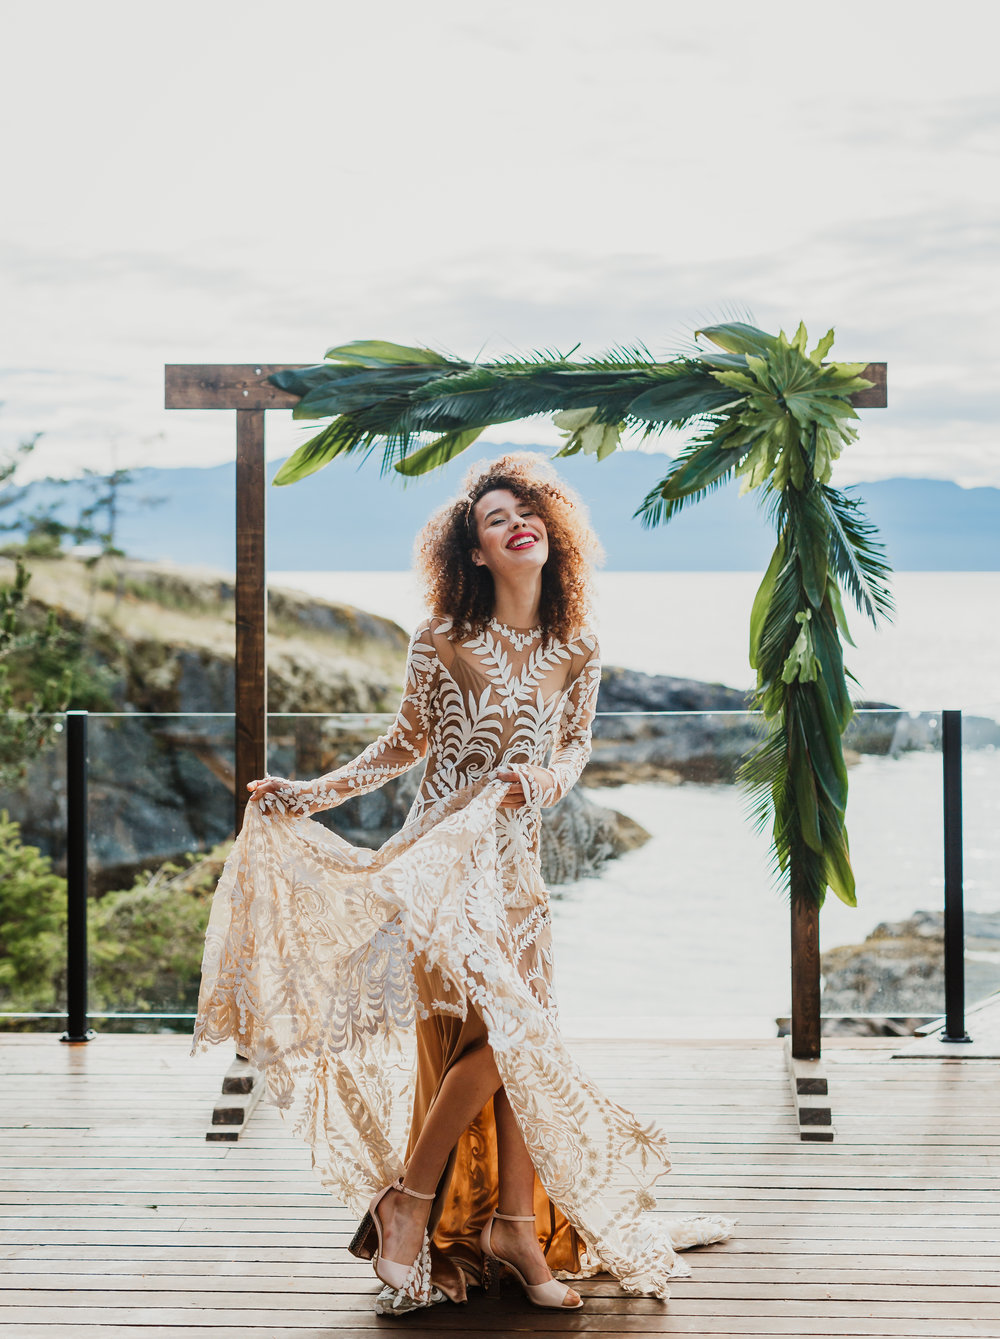 West Coast Bride - Vancouver Wedding Photographer & Videographer - Sunshine Coast Wedding Photos - Sunshine Coast Wedding Photographer - Jennifer Picard Photography - IMG_7648.jpg